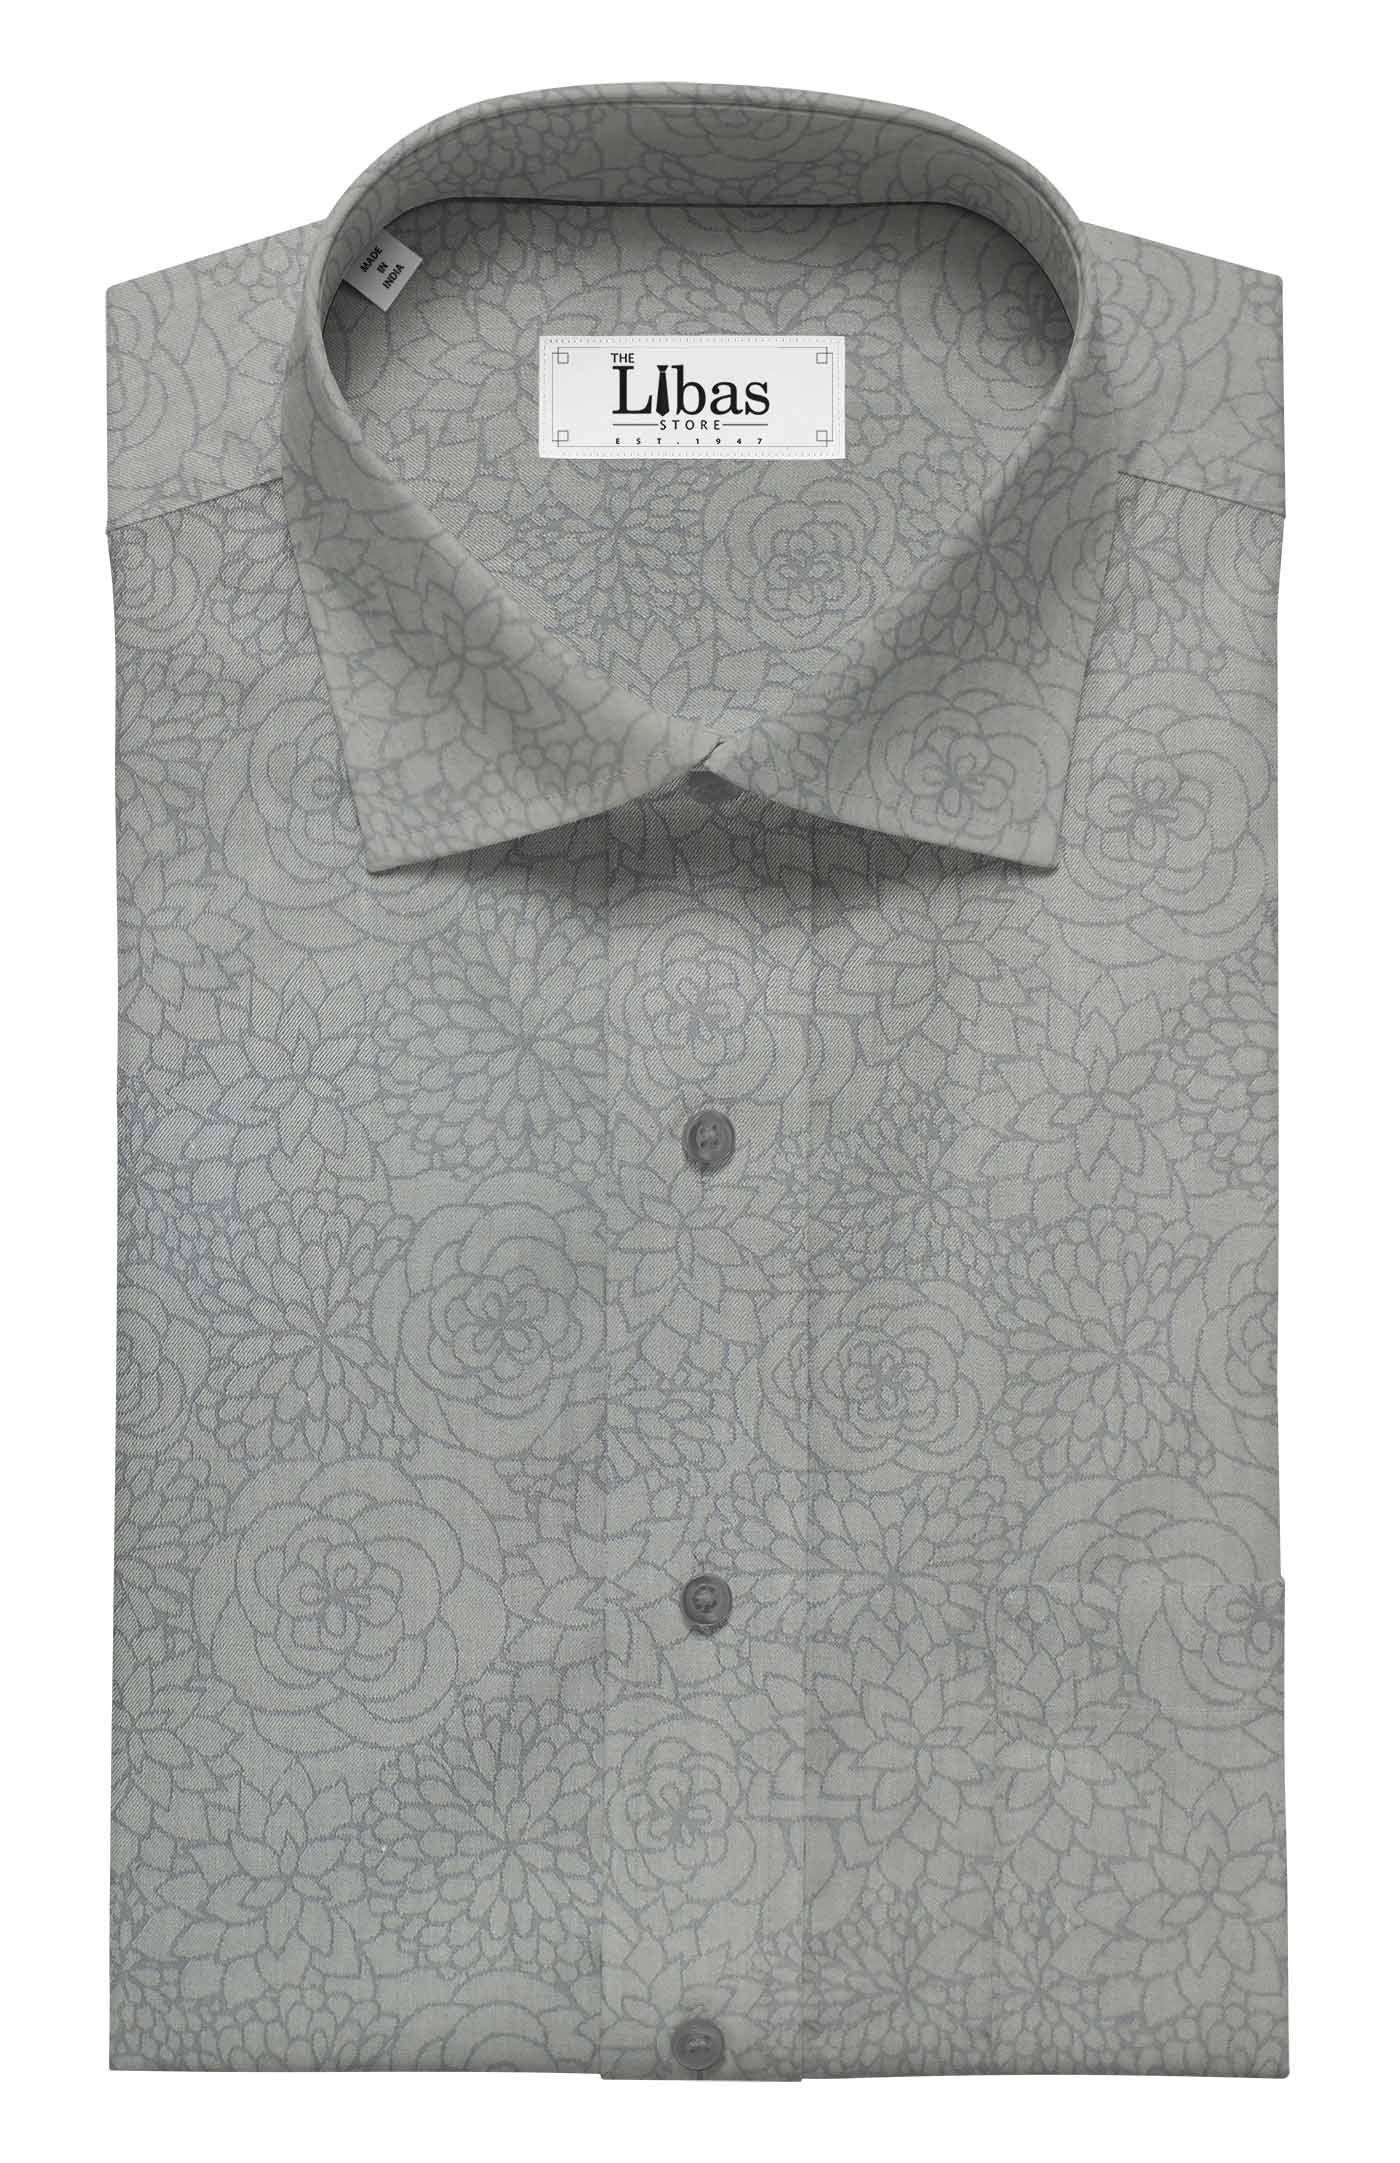 1e39010d9d7 Combo of Raymond Blackish Grey Self Design Trouser Fabric With Fabio  Rossini Light Grey 100% Cotton Jacquard Shirt Fabric (Unstitched)